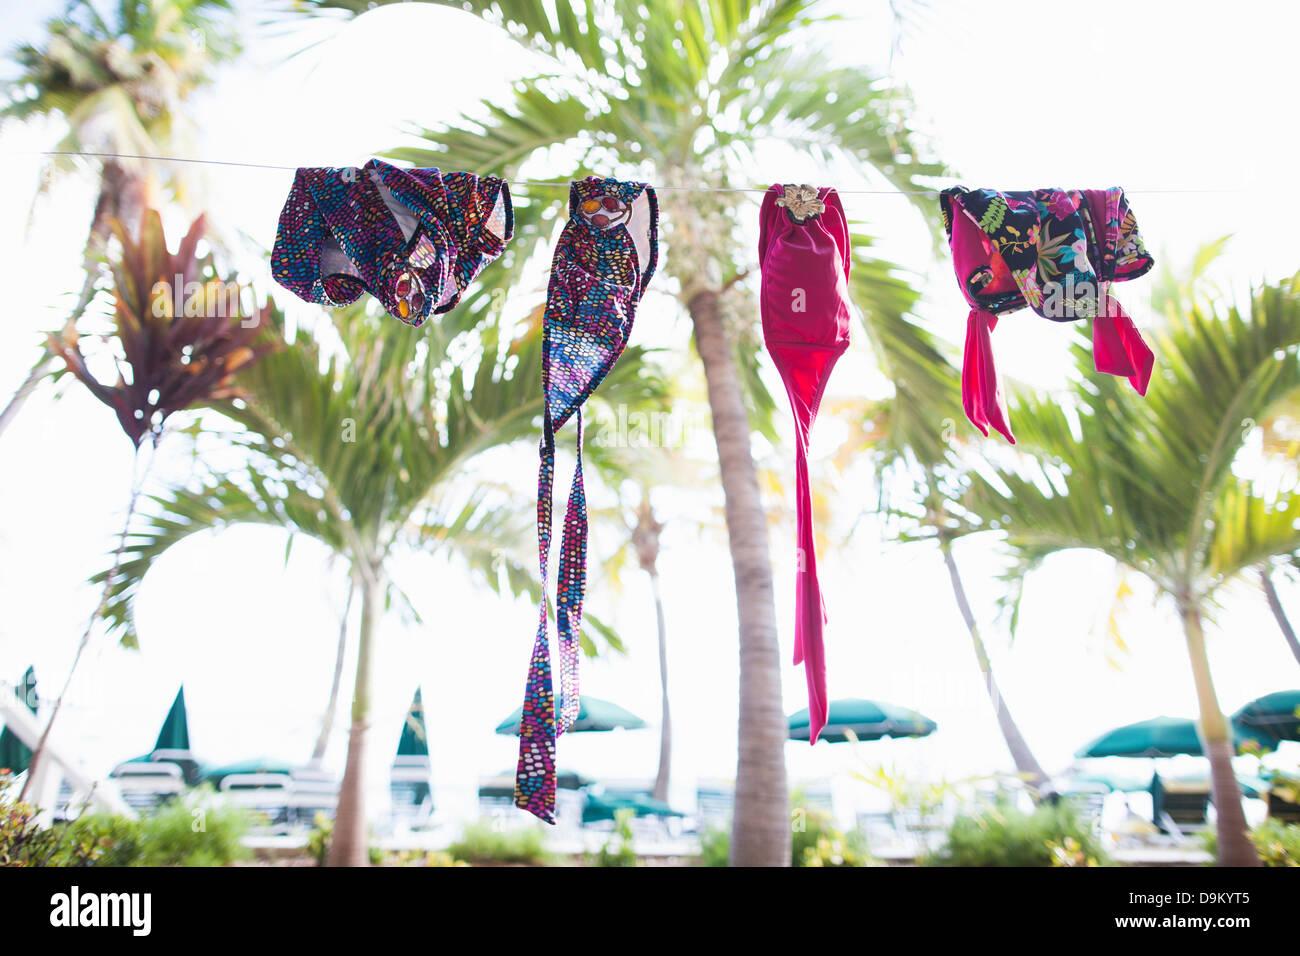 Swimwear on clothesline, St Maarten, Netherlands - Stock Image